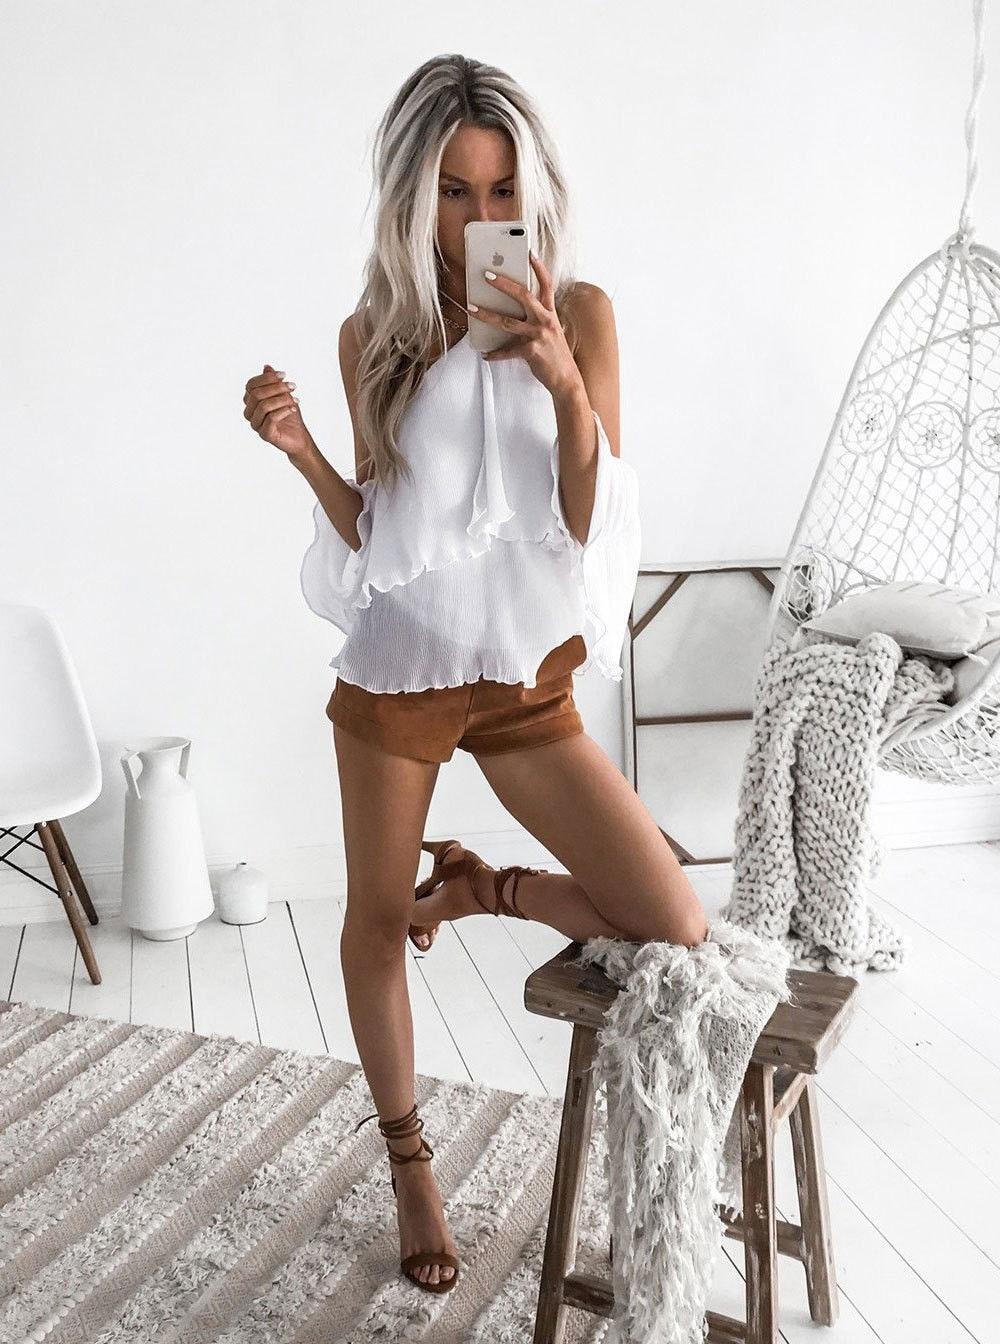 new Classics Comfort Off Shoulder Shirt Tops Womens female Summer Ruffle Shirts Festivals Cute Ladies Loose Casual  Blouse xxl